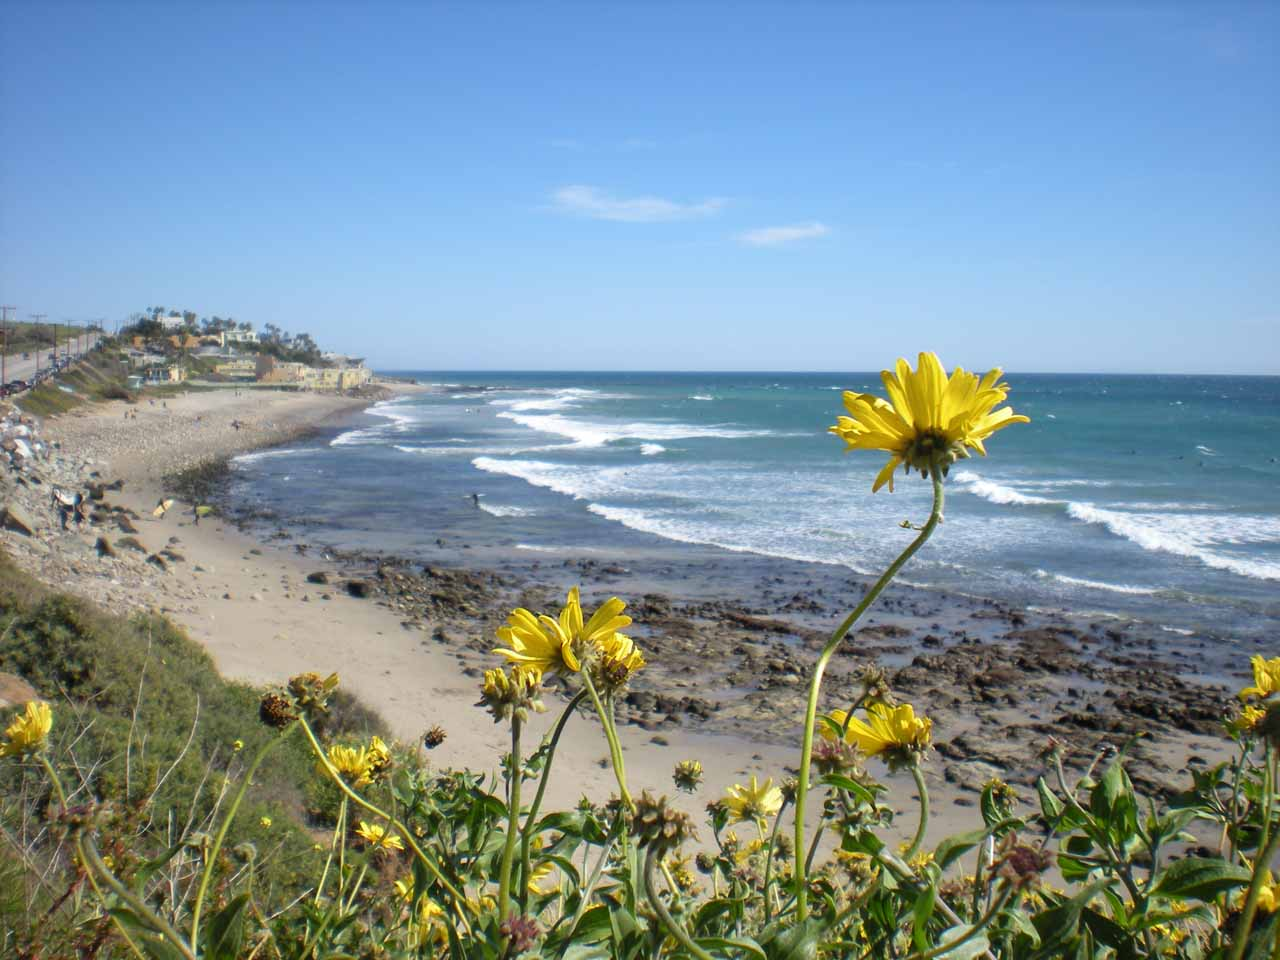 Flowers blooming along the coast of Malibu